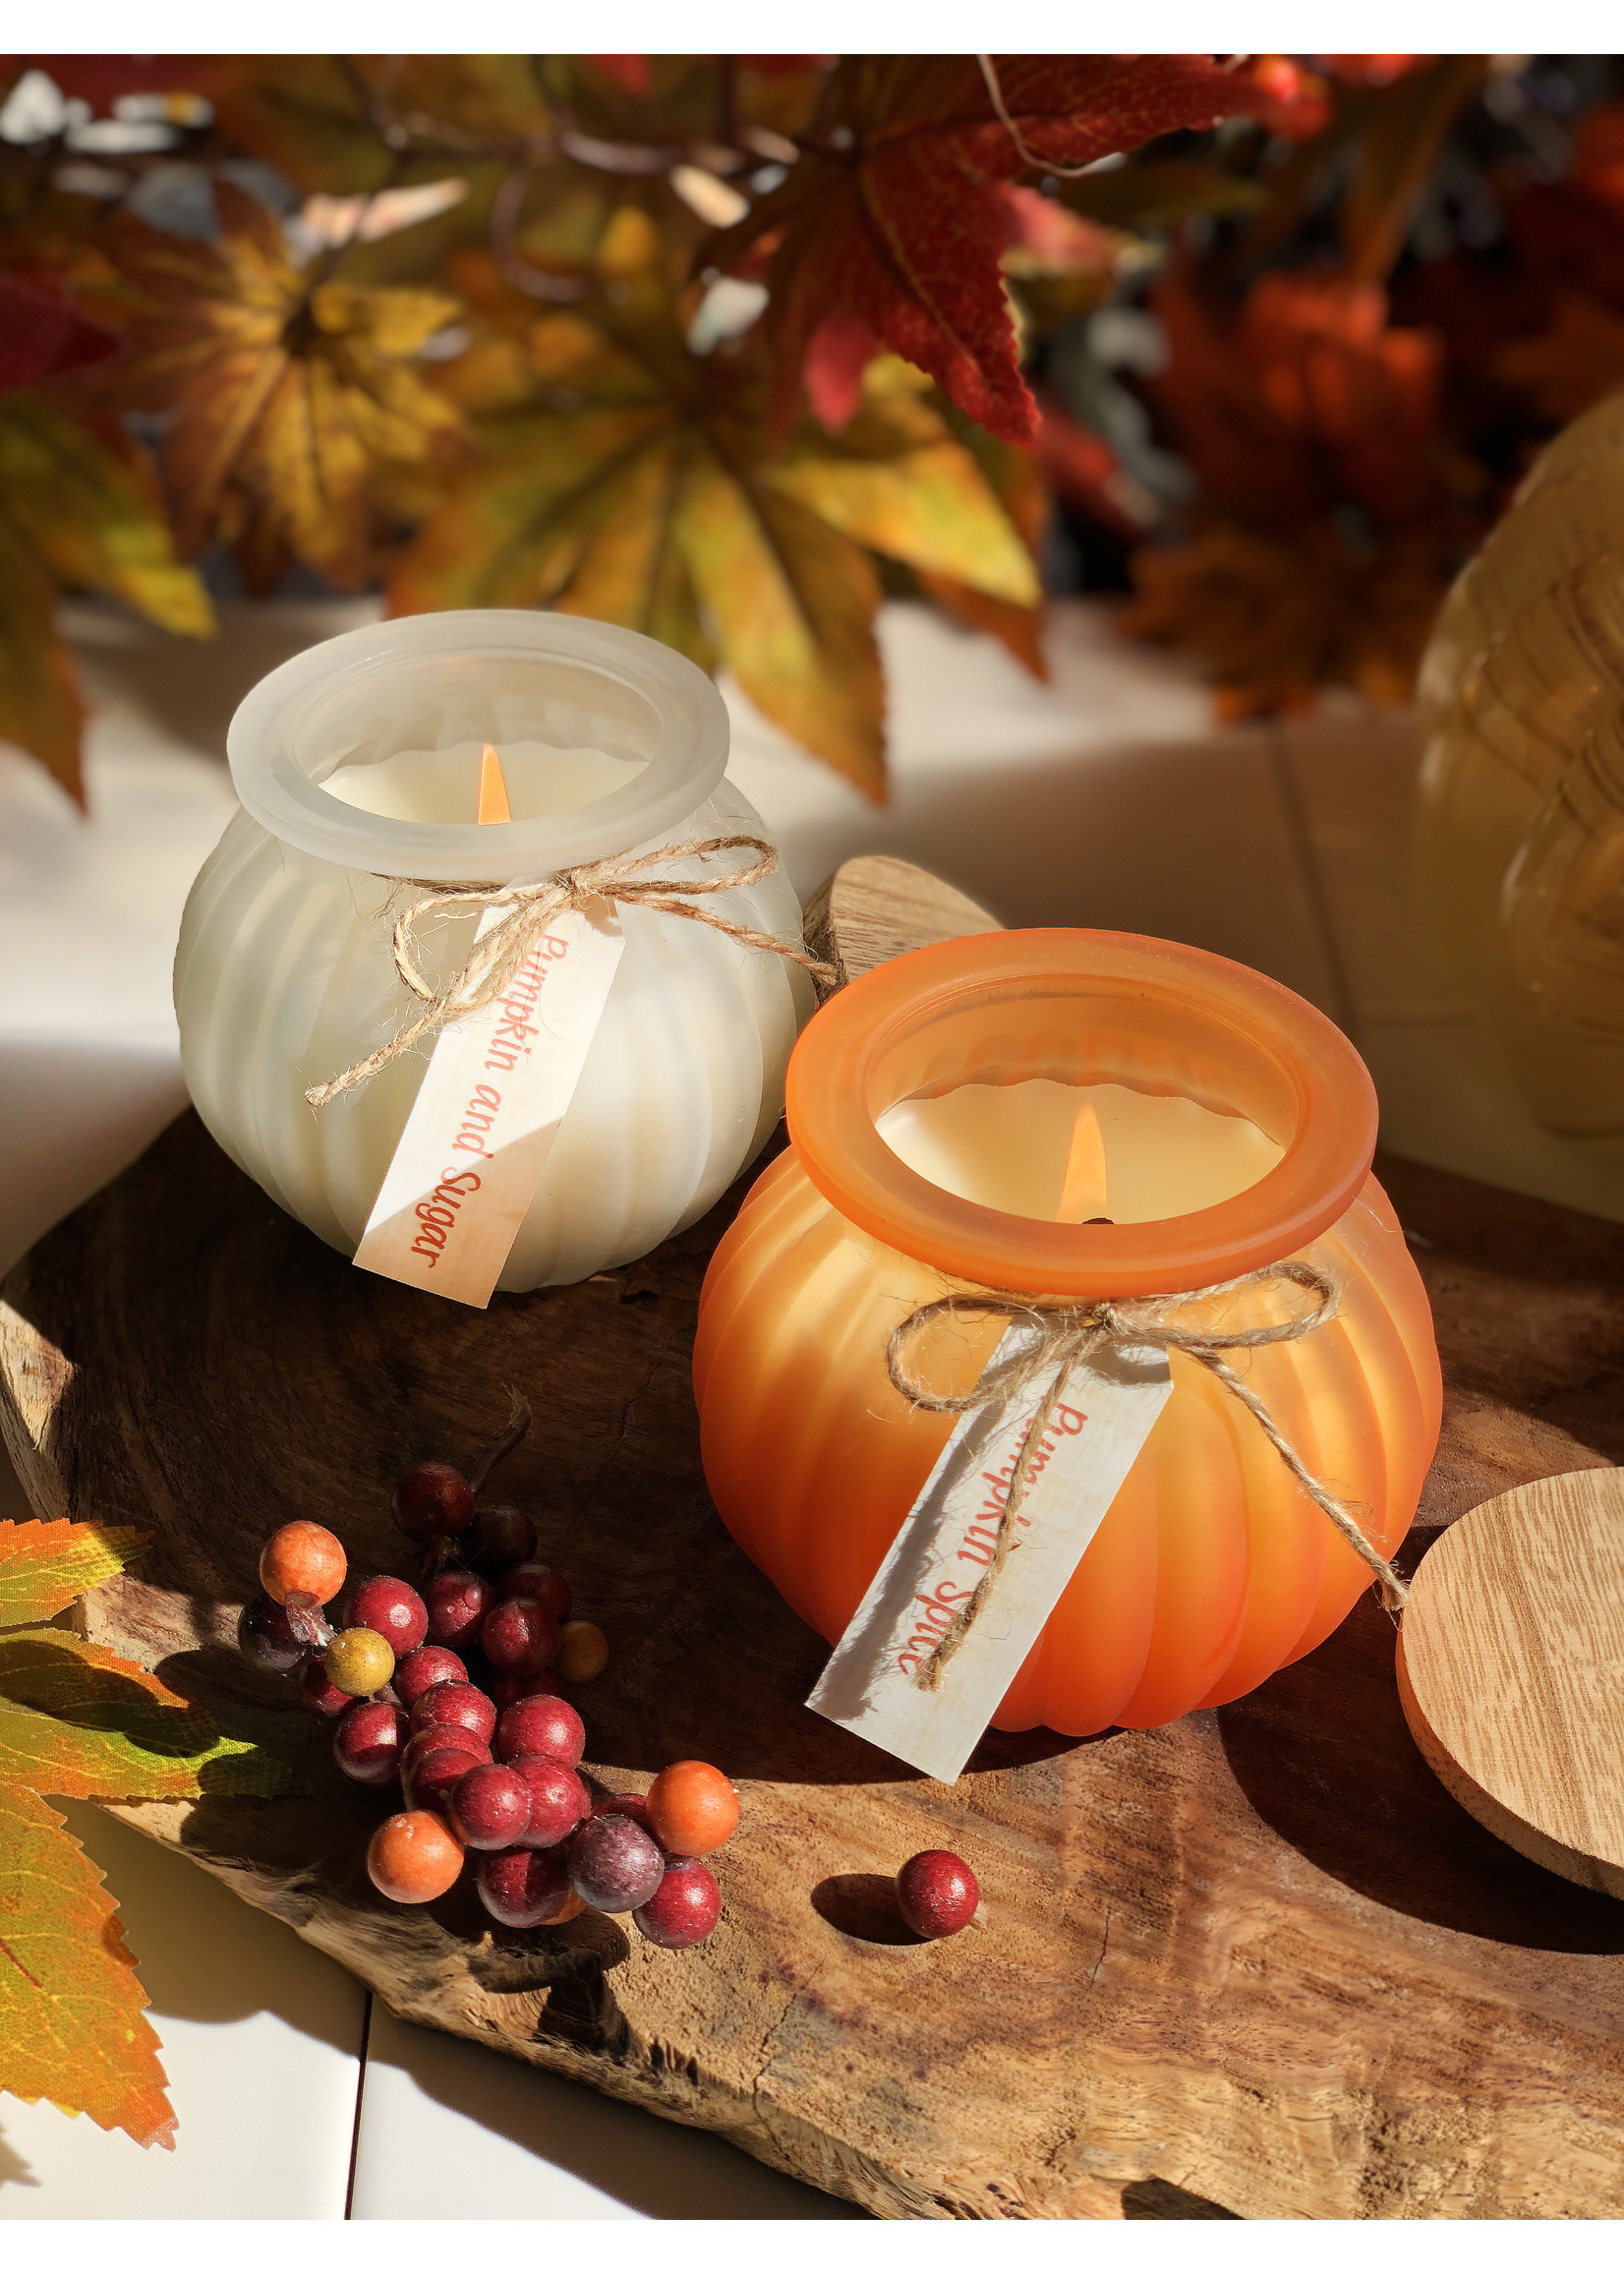 At Home by Mirabeau 7 oz Pumpkin Shaped Glass Candle,  Pumpkin Spice